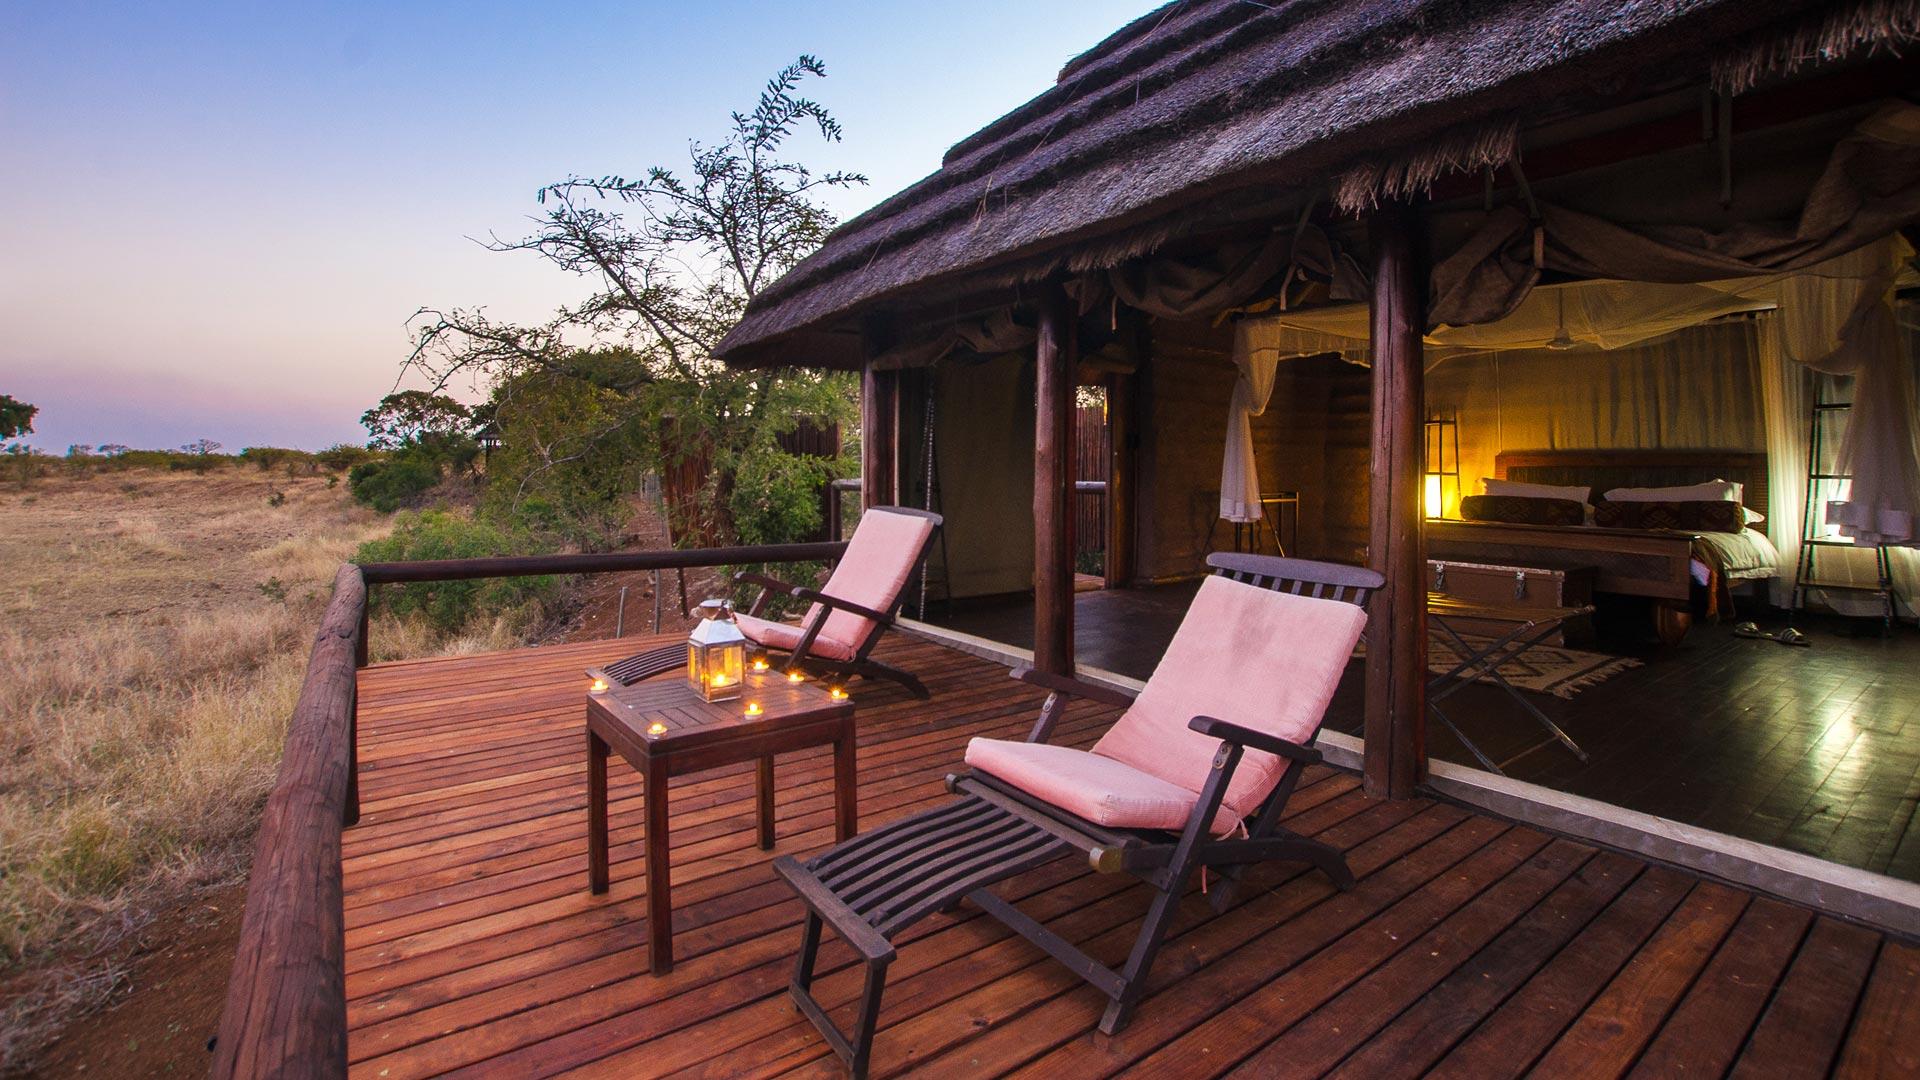 03 Days Camp Shonga Safari